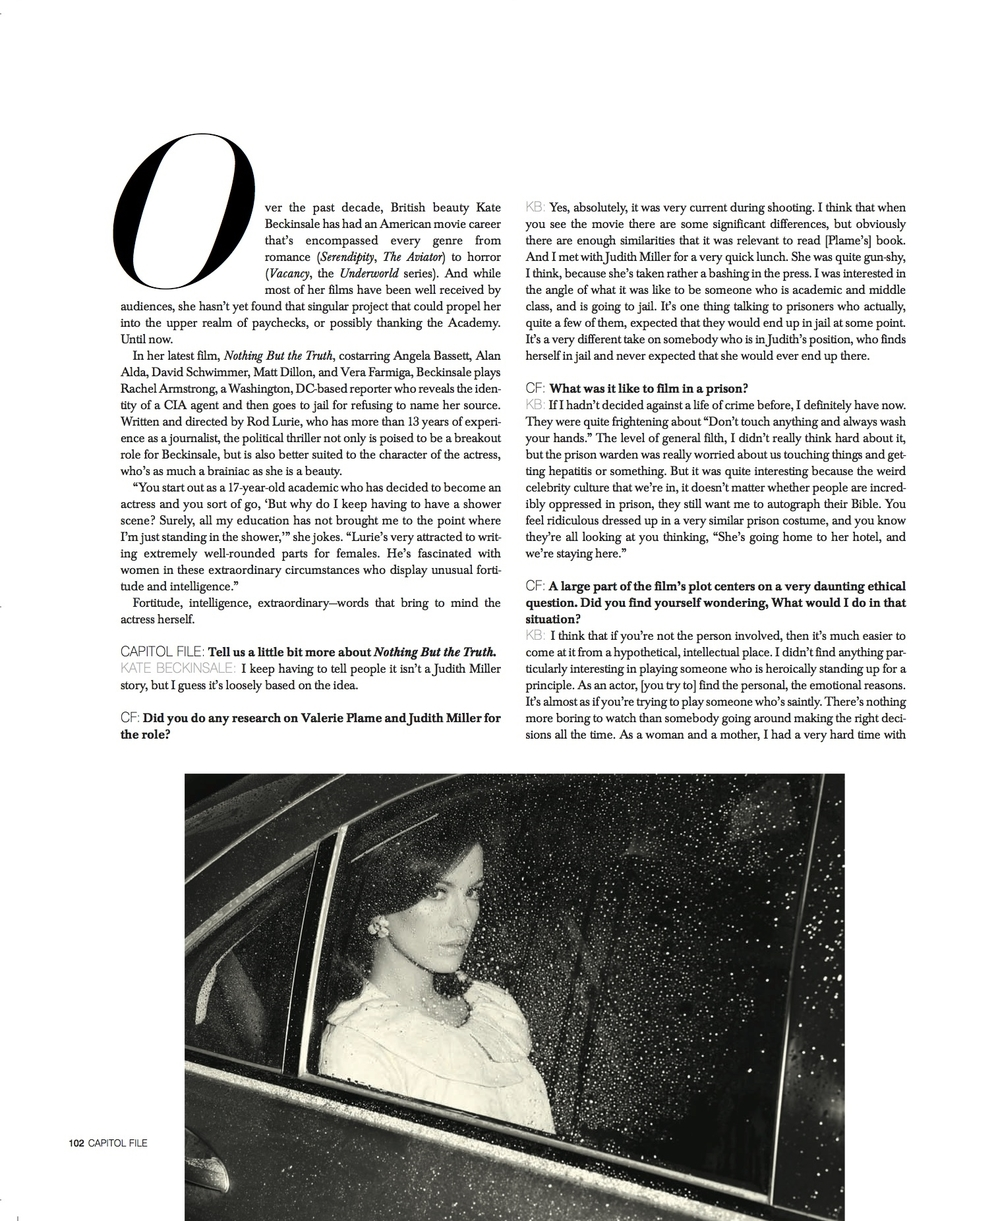 Kate Beckinsale2C.jpg